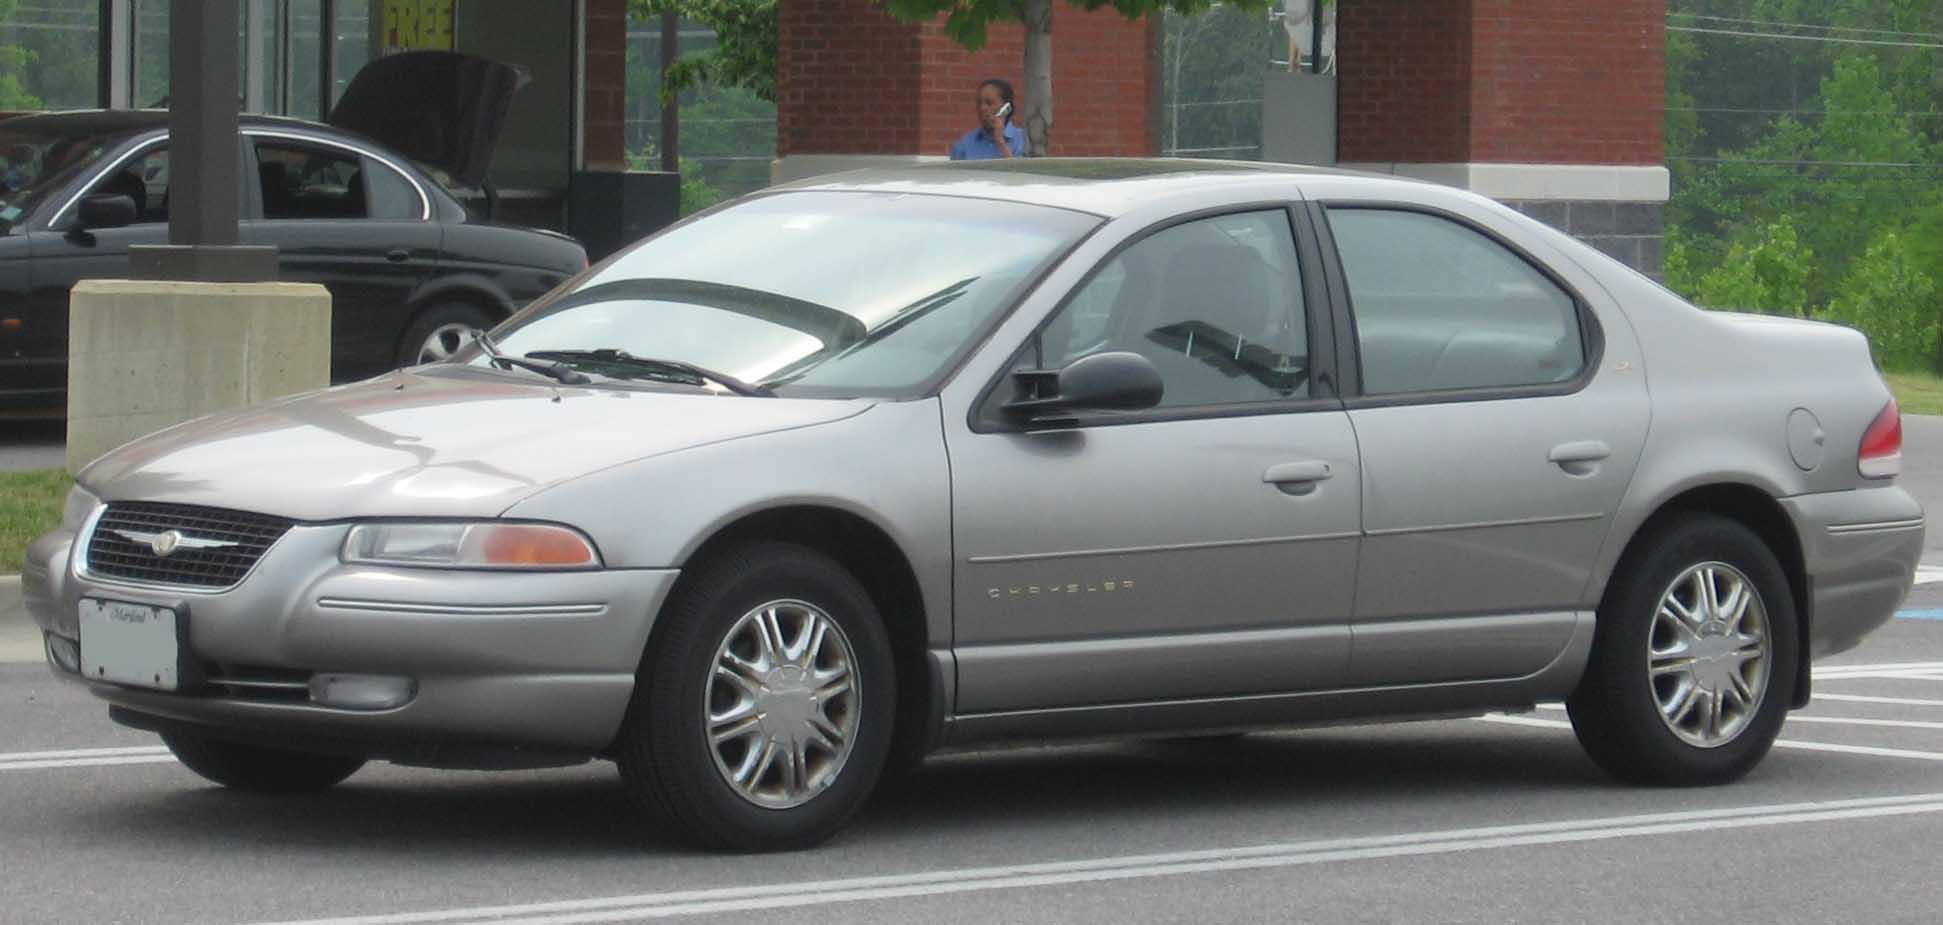 Chrysler Cirrus 1995 - 2000 Sedan #6